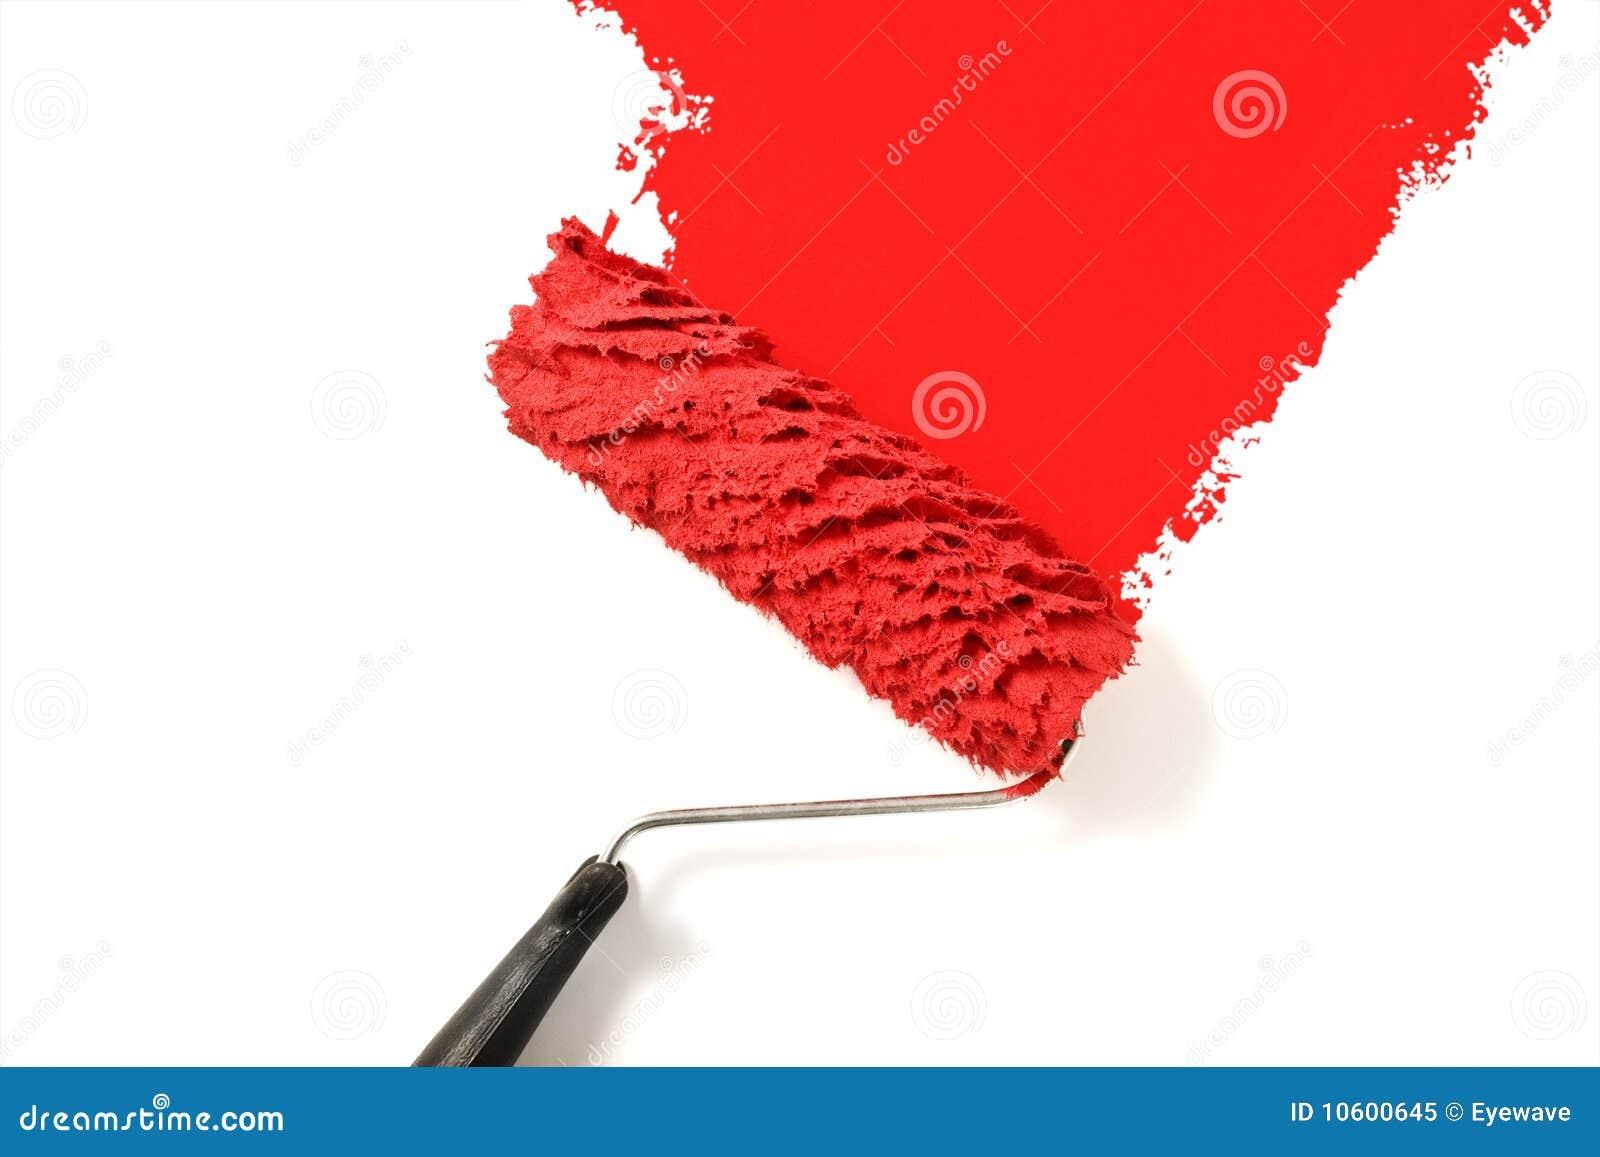 Rojo de la pintura del rodillo de pintura